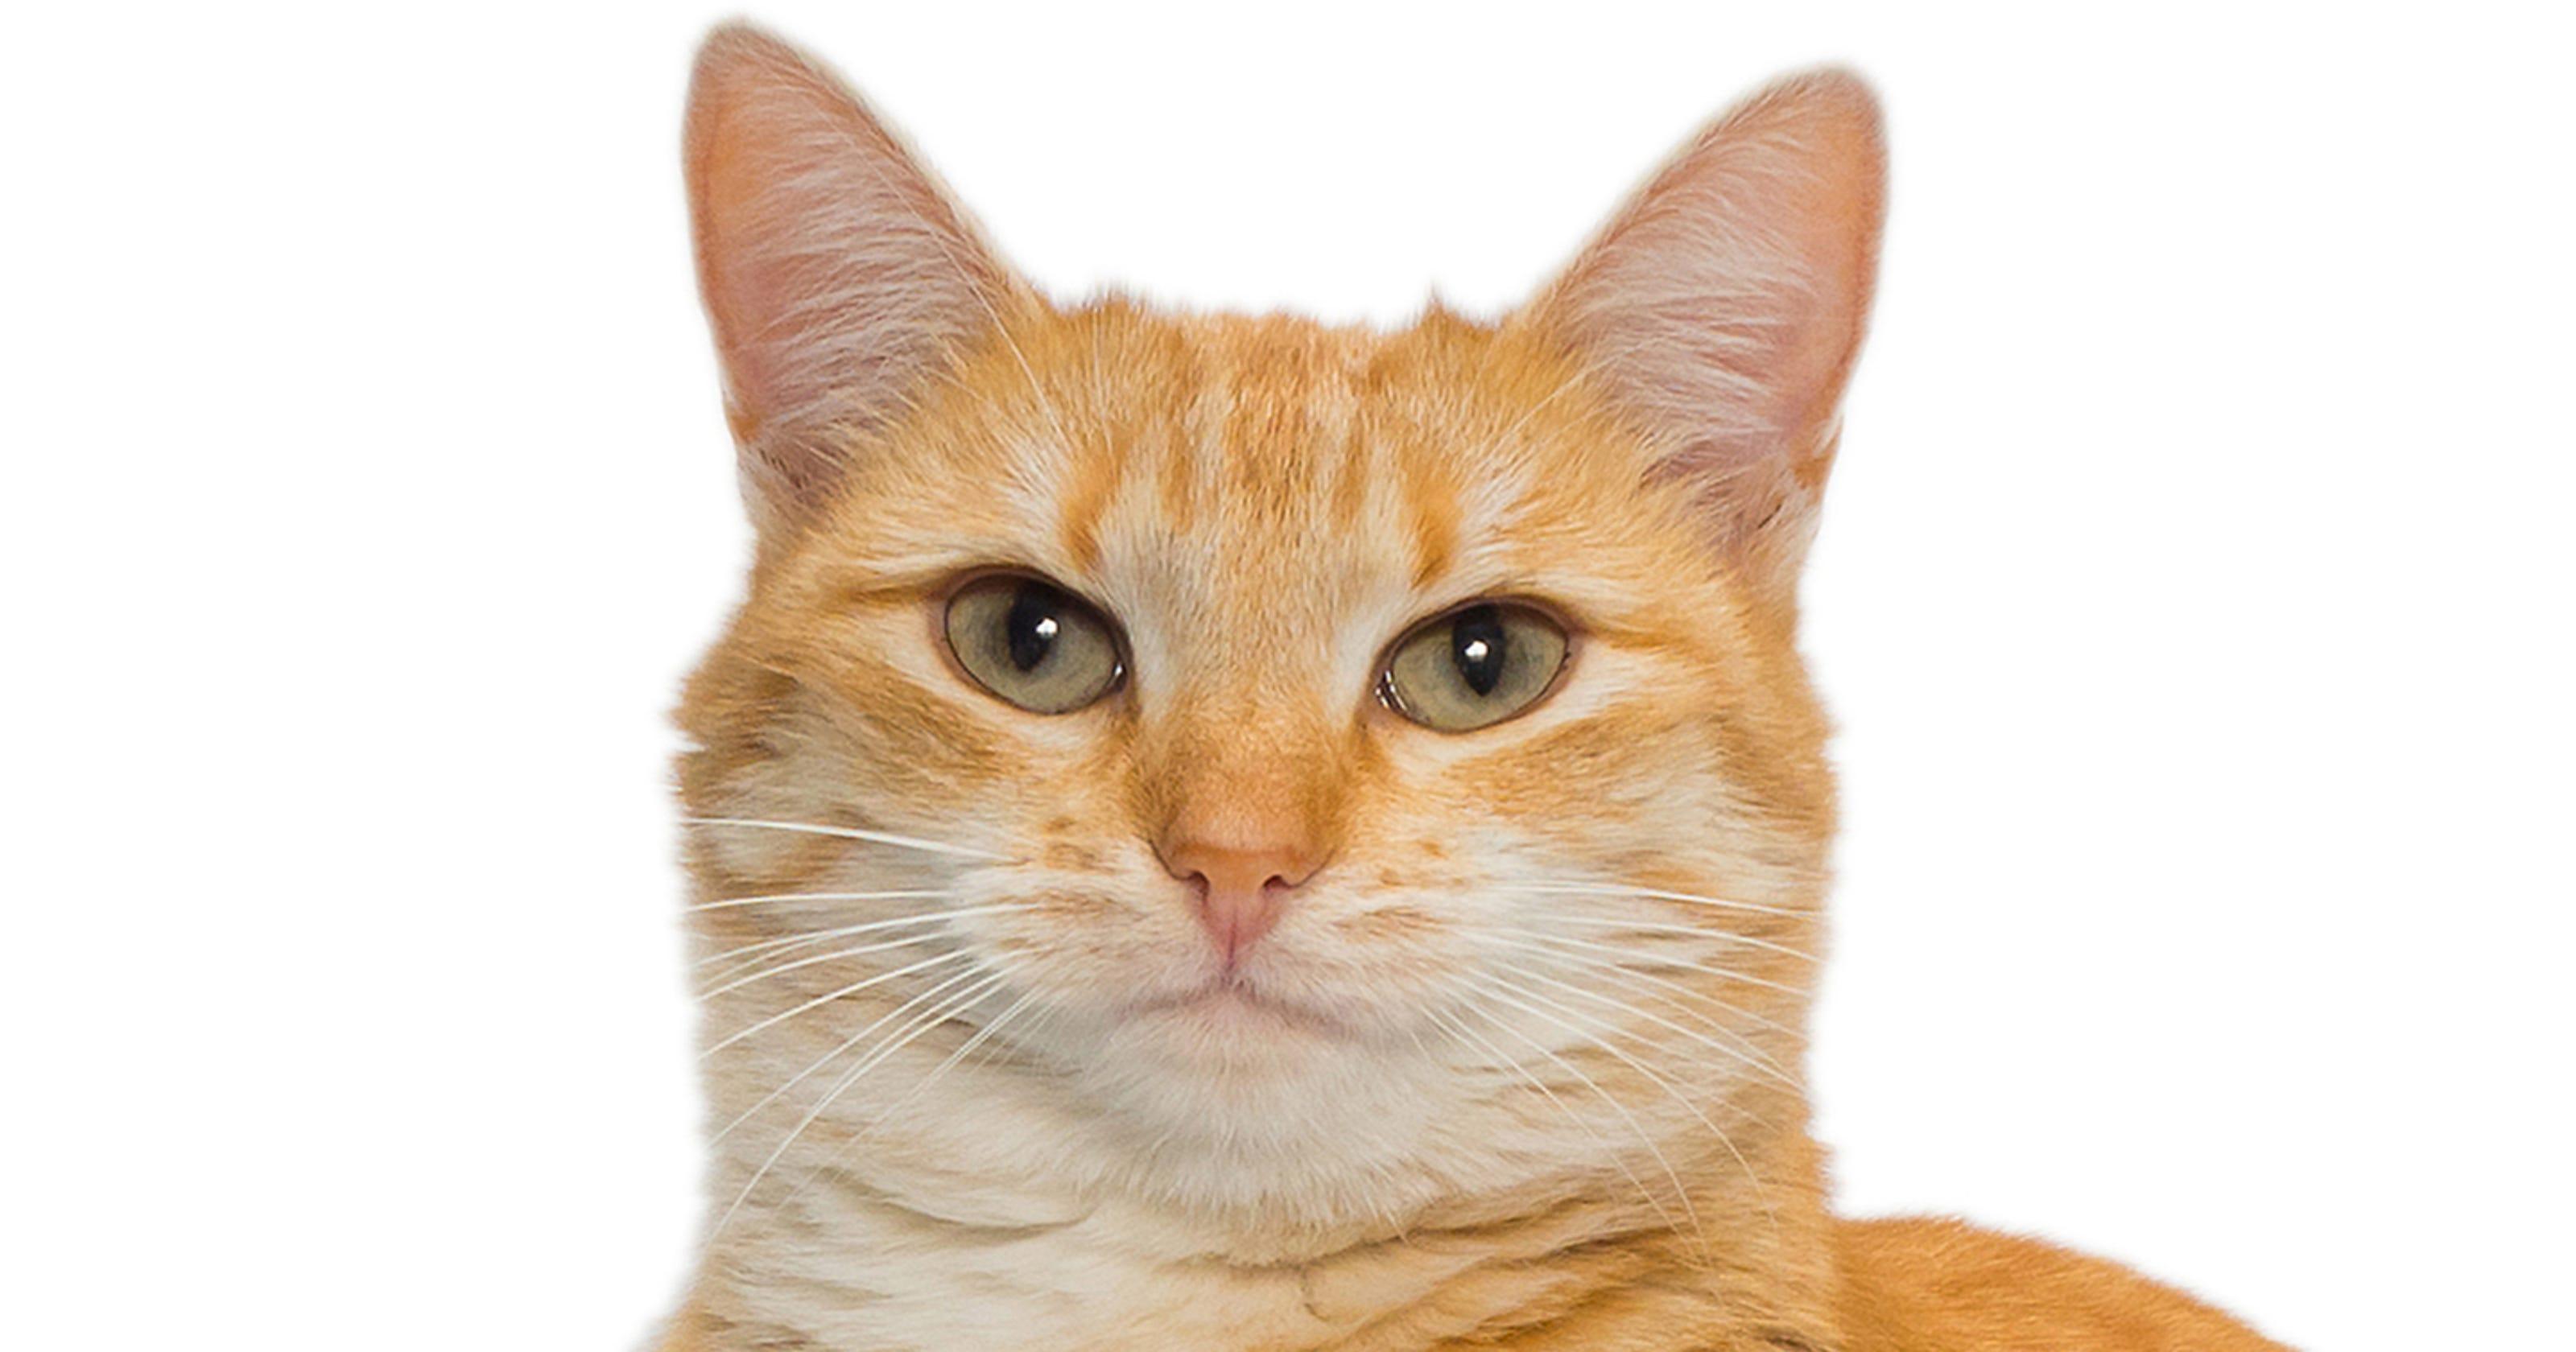 Serial cat killer suspected in Washington, at least 13 ...